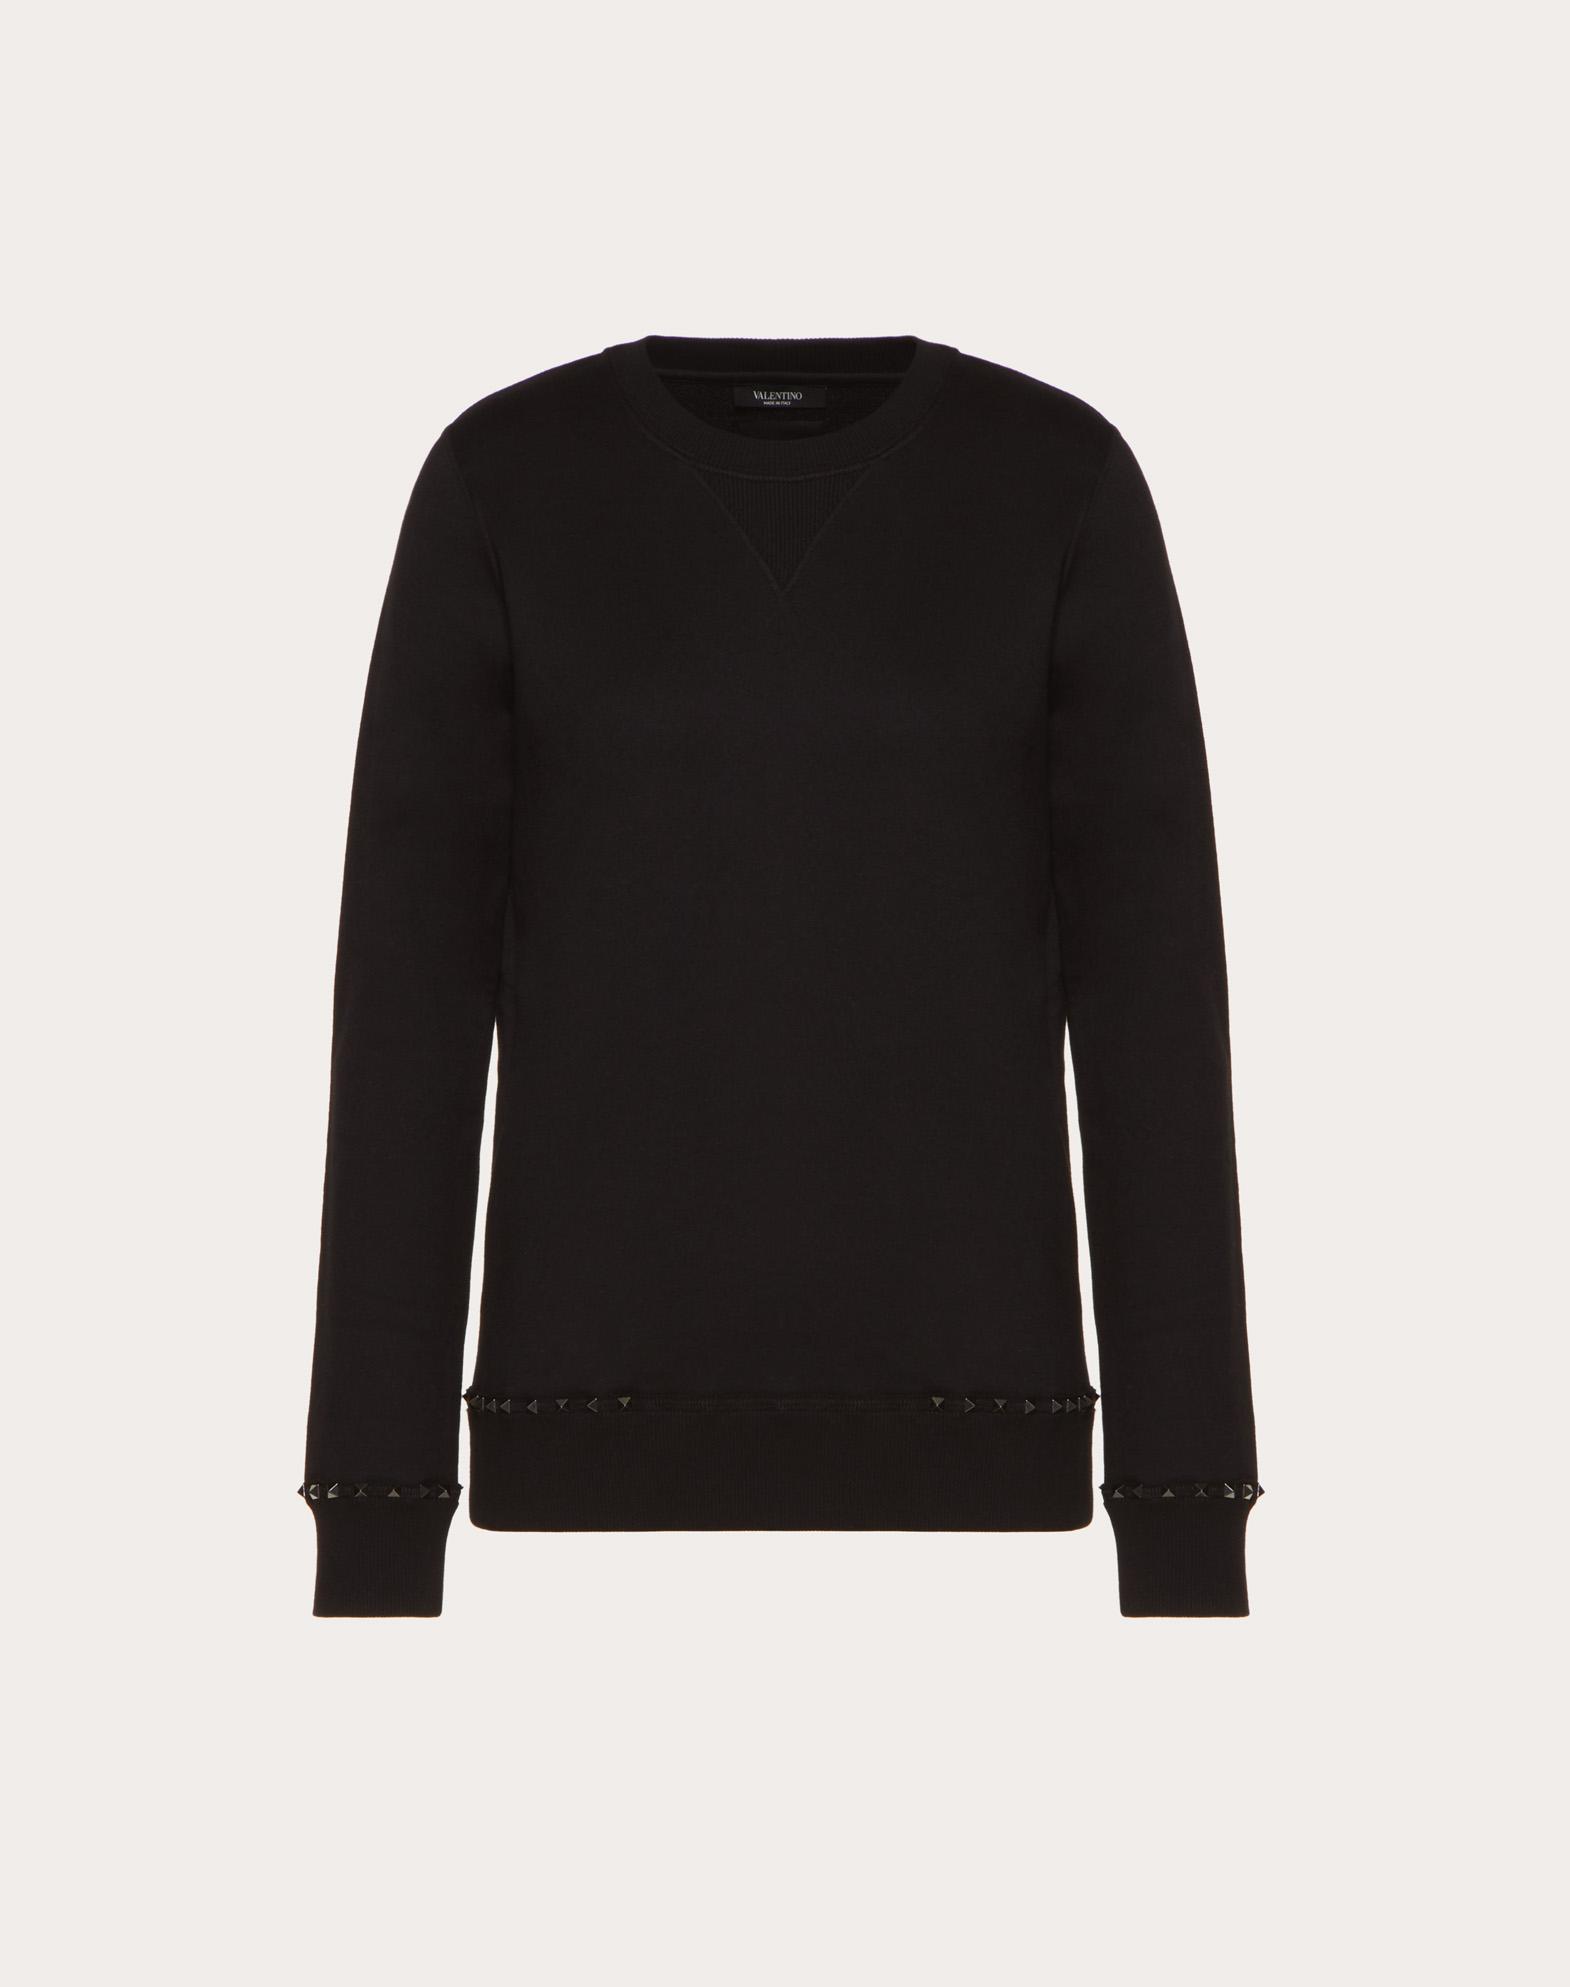 Rockstud Untitled Noir sweatshirt